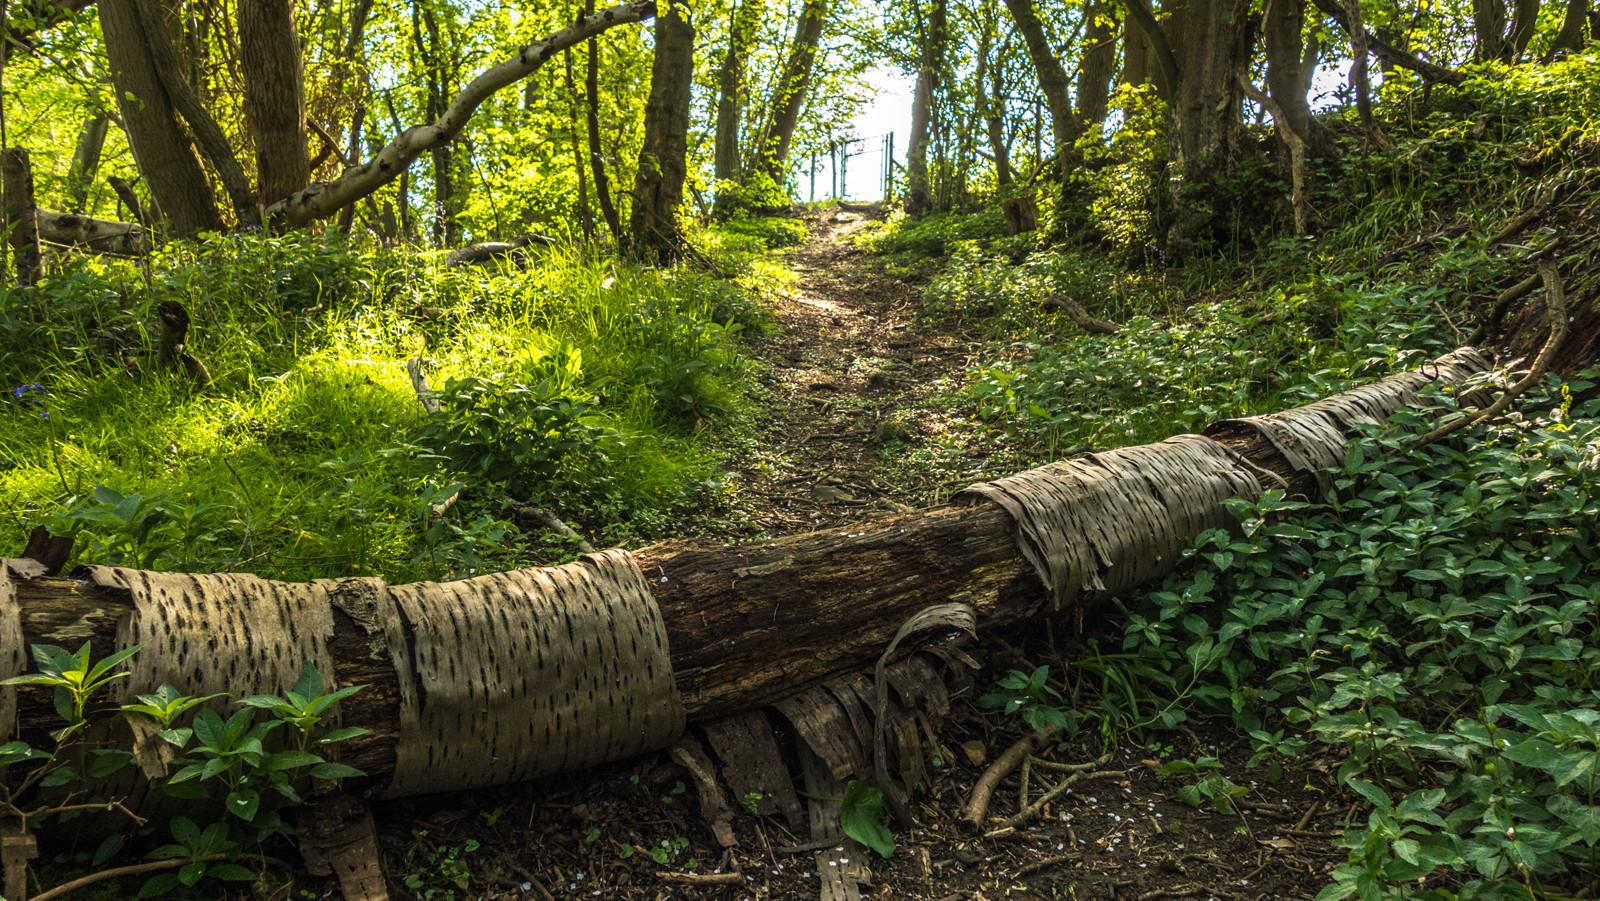 Elham Valley Ancient Woods